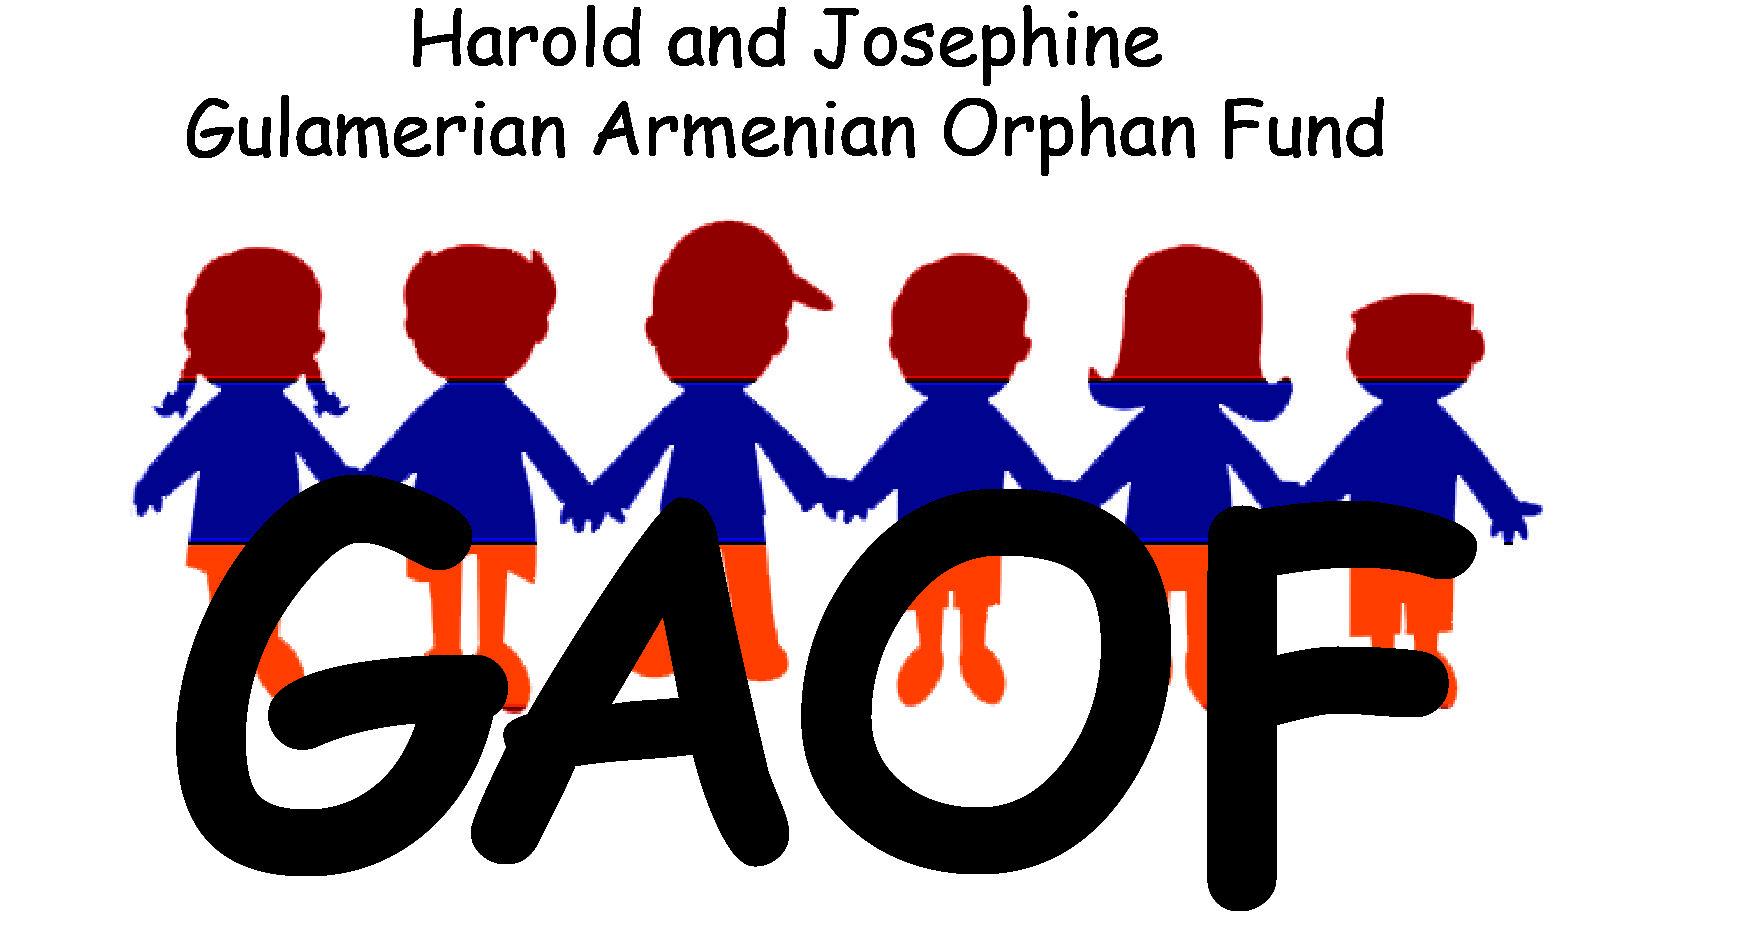 Harold and Josephine Gulamerian Armenian Orphan Fund